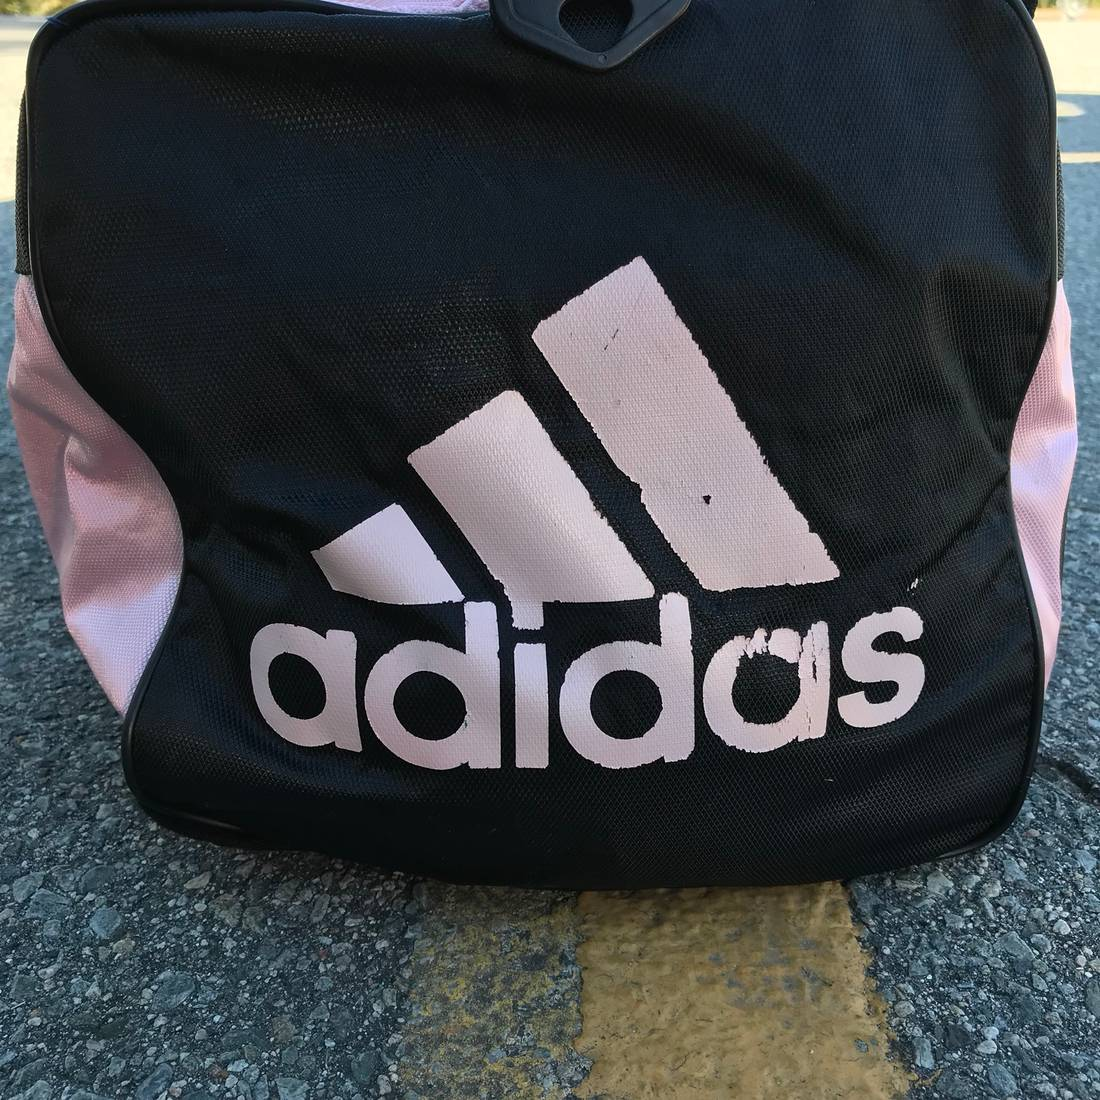 92d89d1cb7 Vintage Adidas Leather Gym Bag